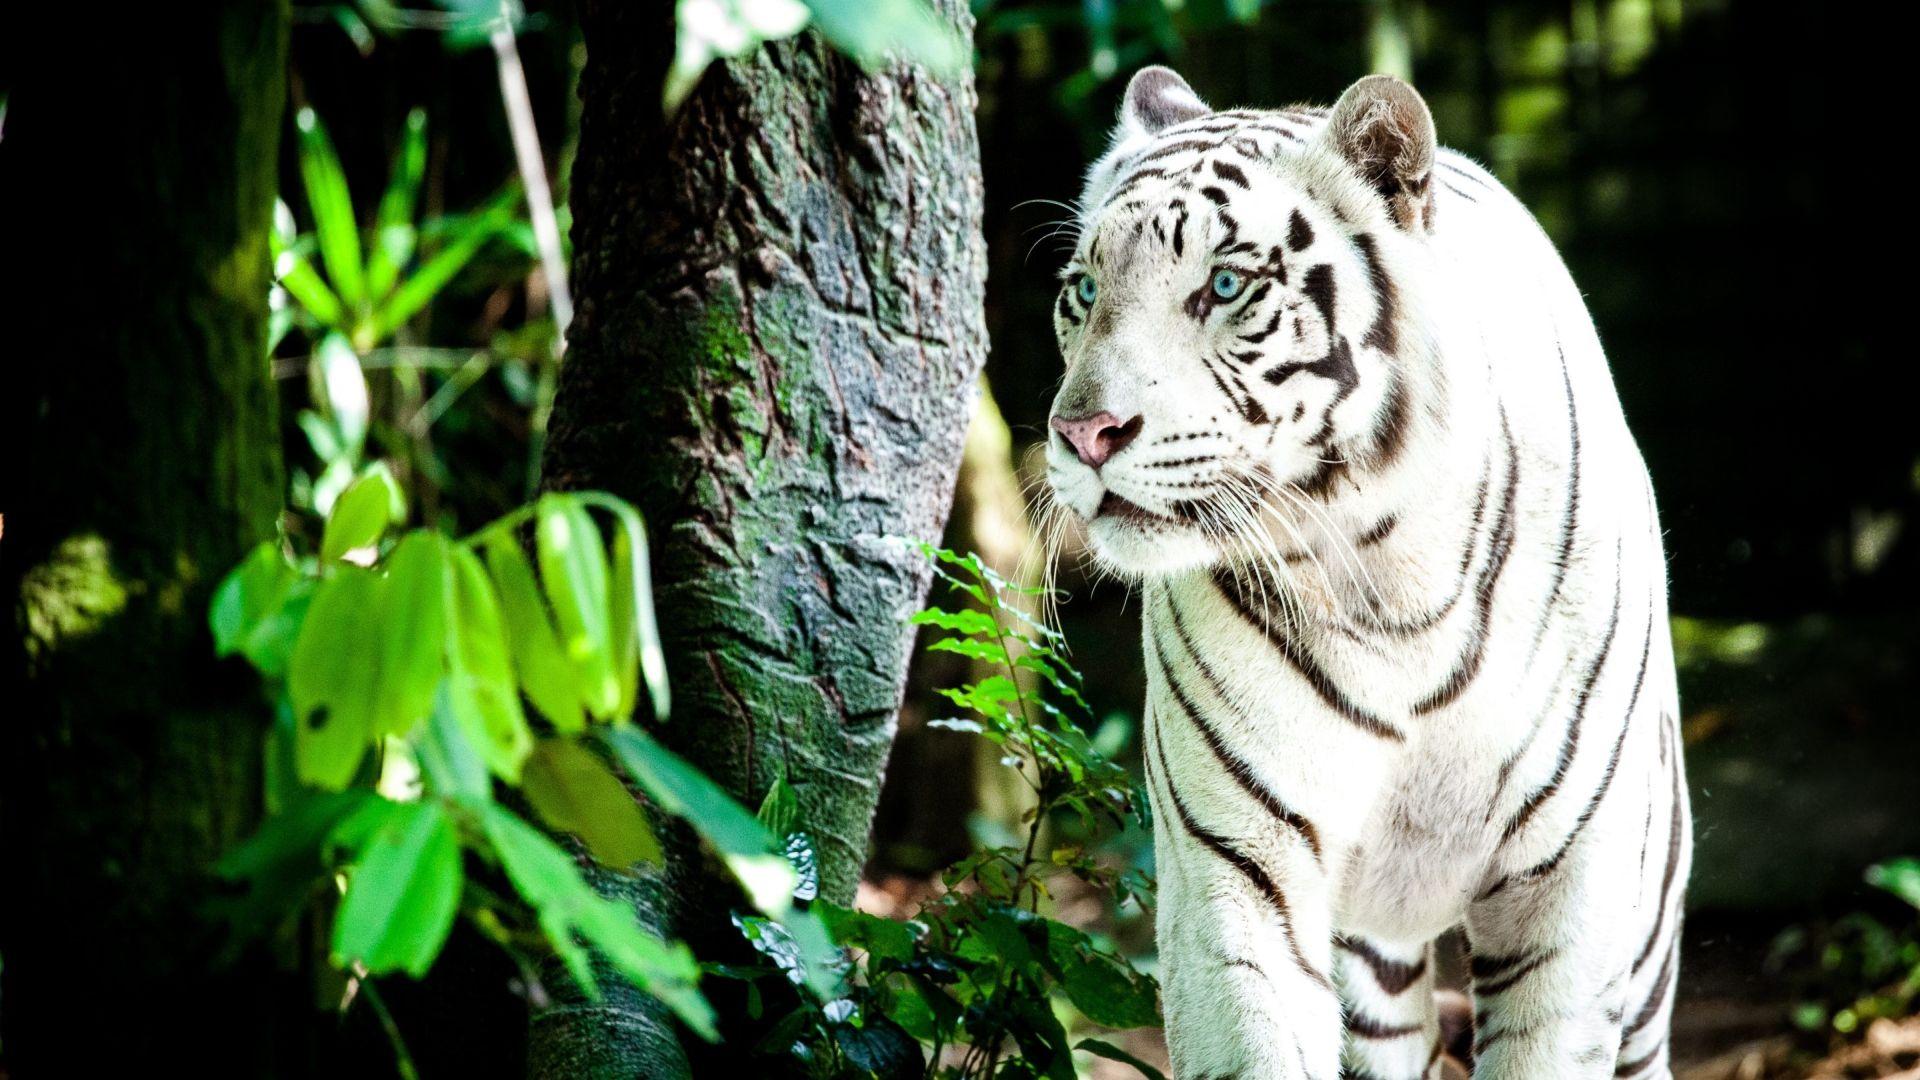 White Tiger, Free Download Wallpaper